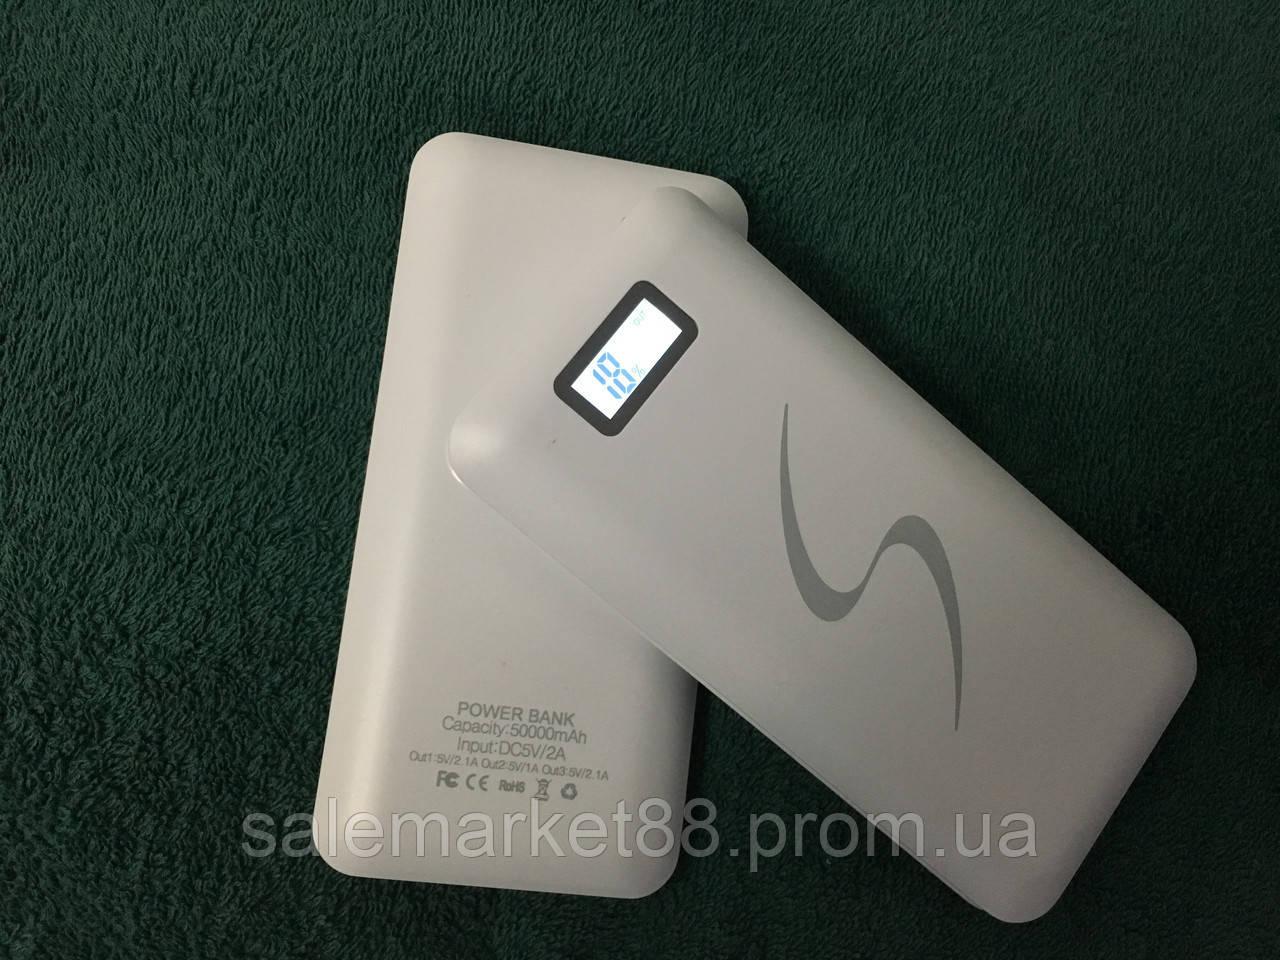 Smart PowerBank 50000mAh 2 USB с экраном